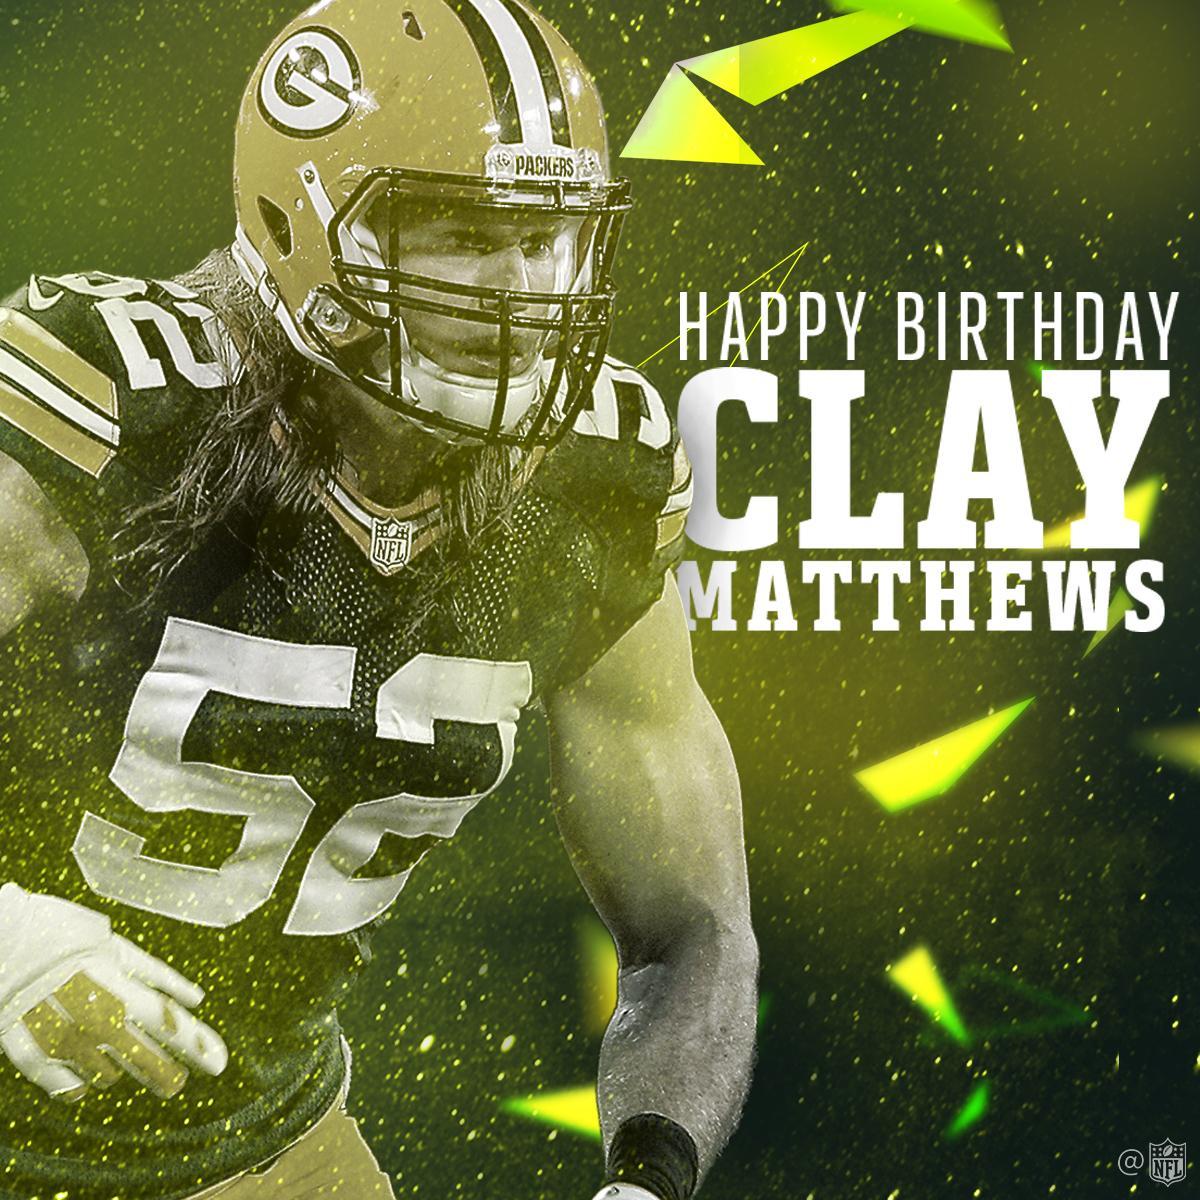 Join us in wishing @packers LB @ClayMatthews52 a Happy Birthday! �� https://t.co/zRhKtGhNux